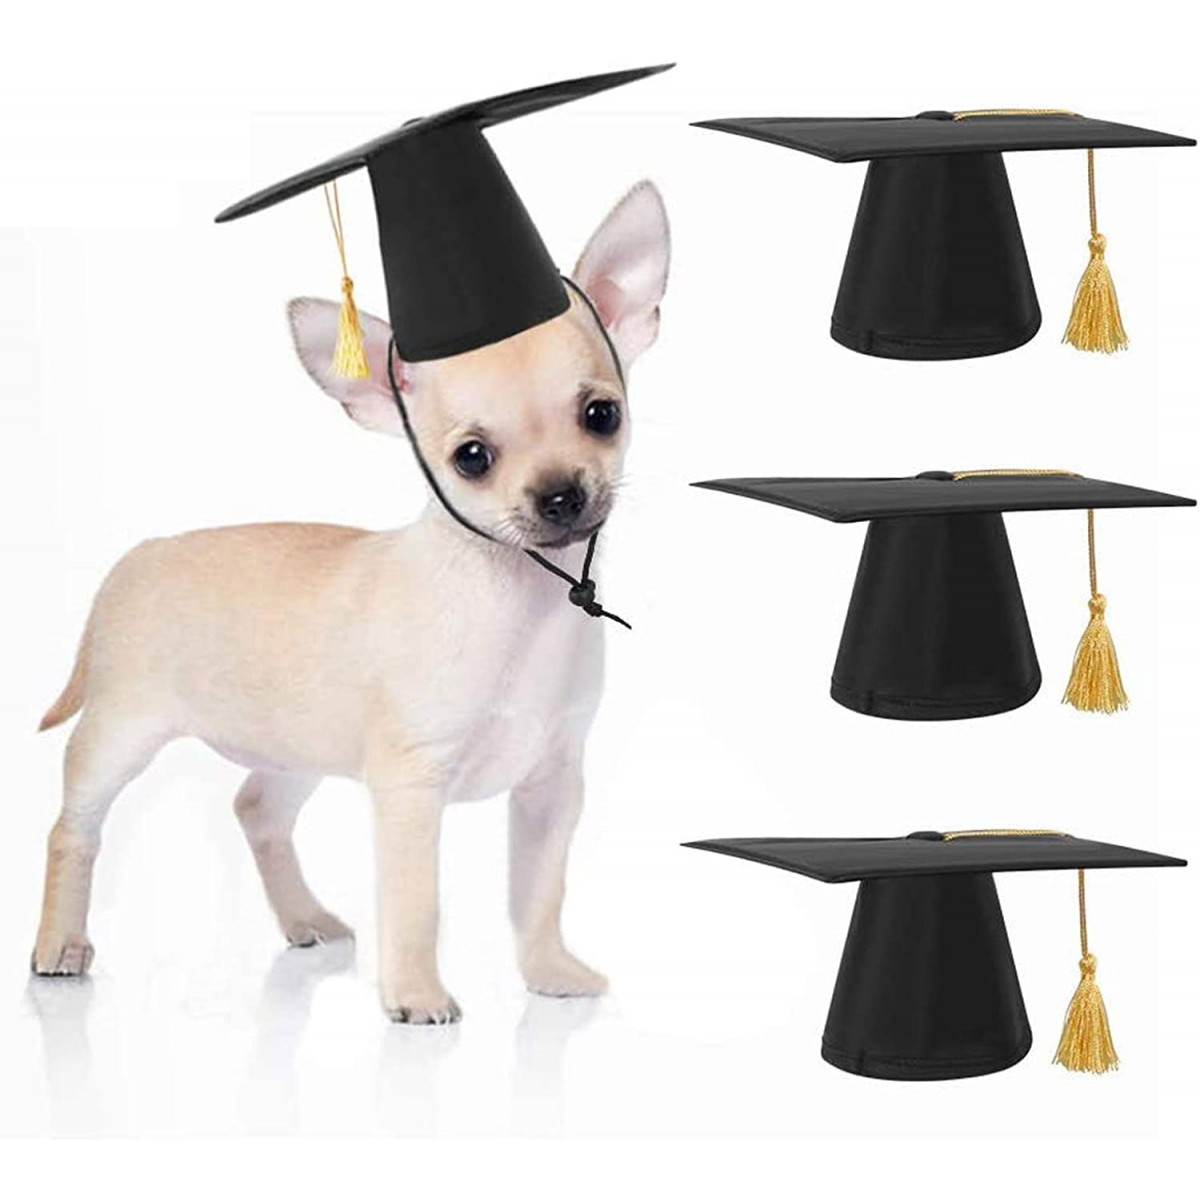 Set 3 cappelli laurea per cani, simpatici resistenti